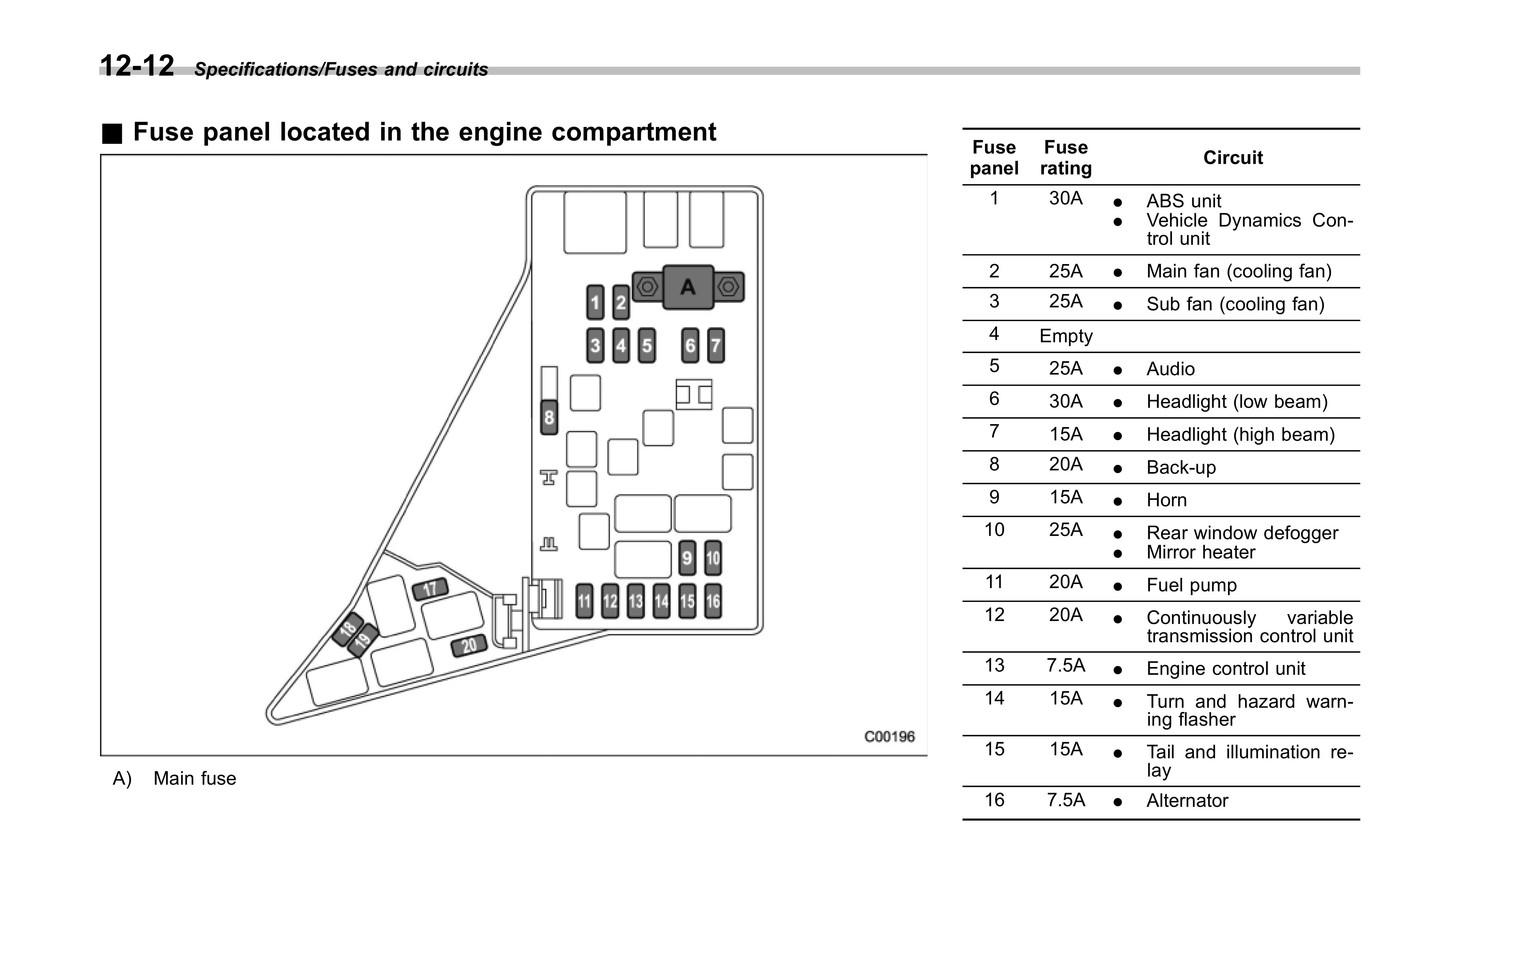 2009 Subaru Impreza Fuse Box Diagram / Fuse Box Diagram